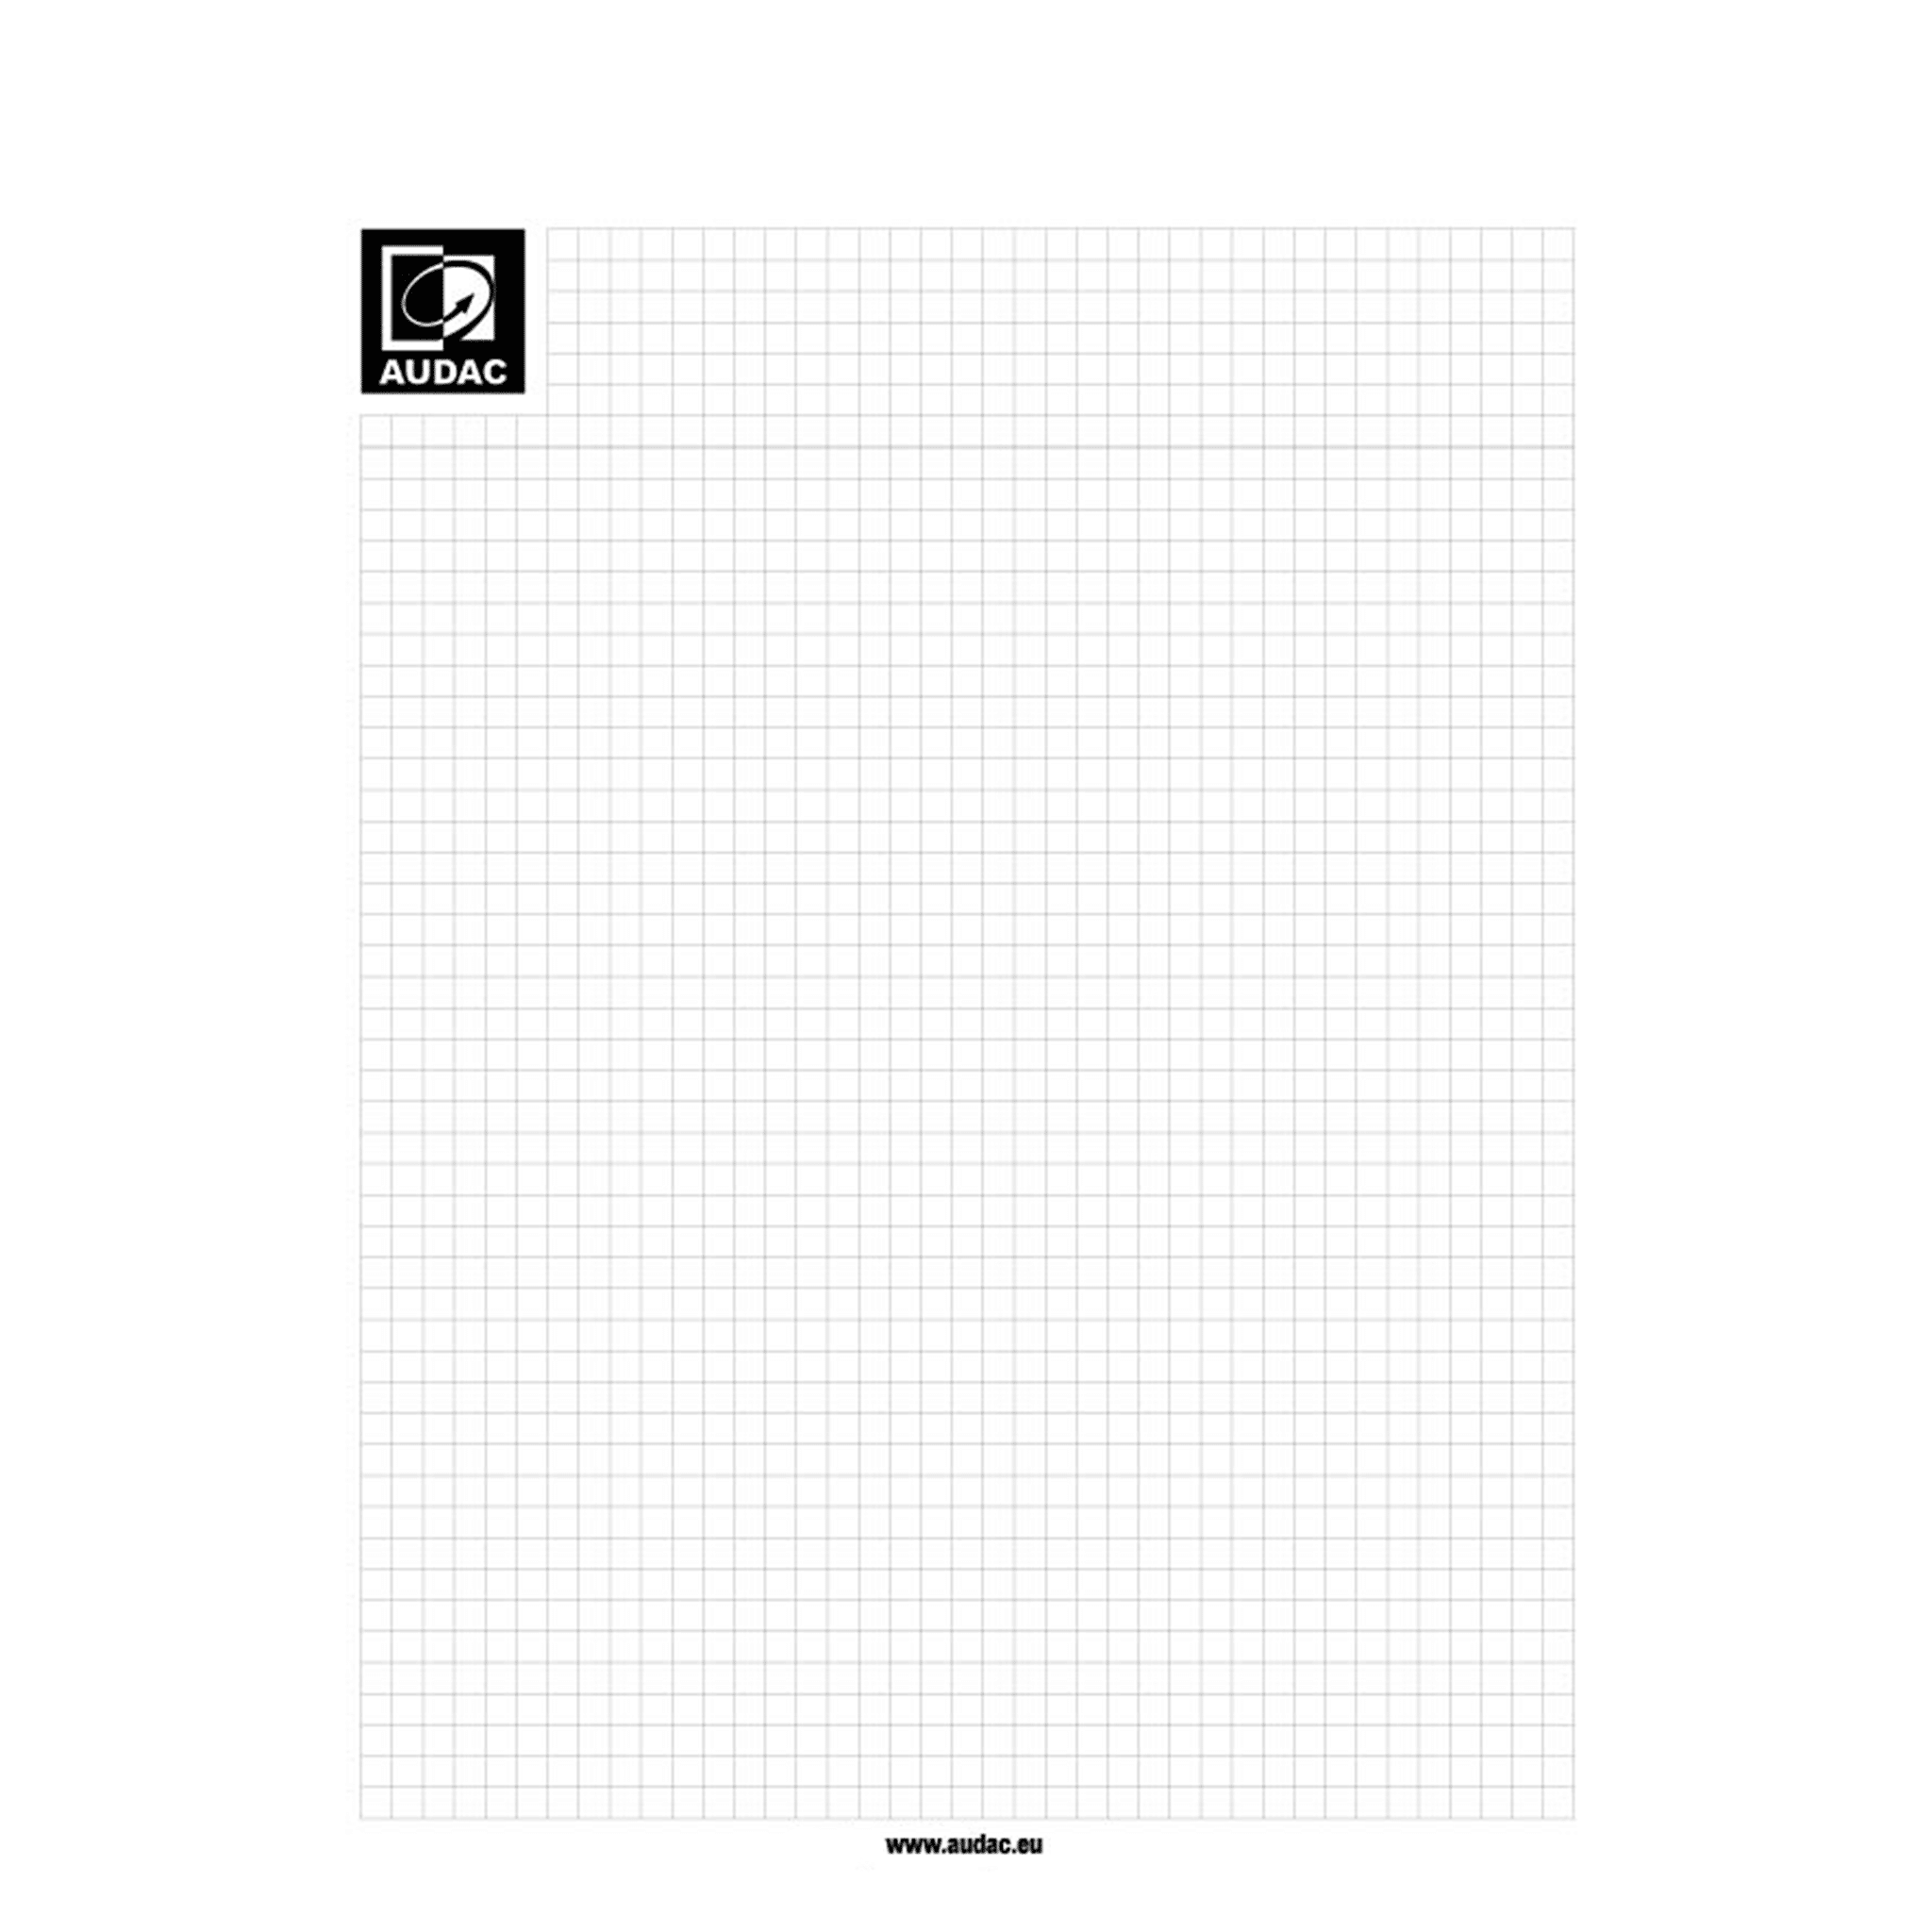 PROMO5041 - AUDAC A4 document